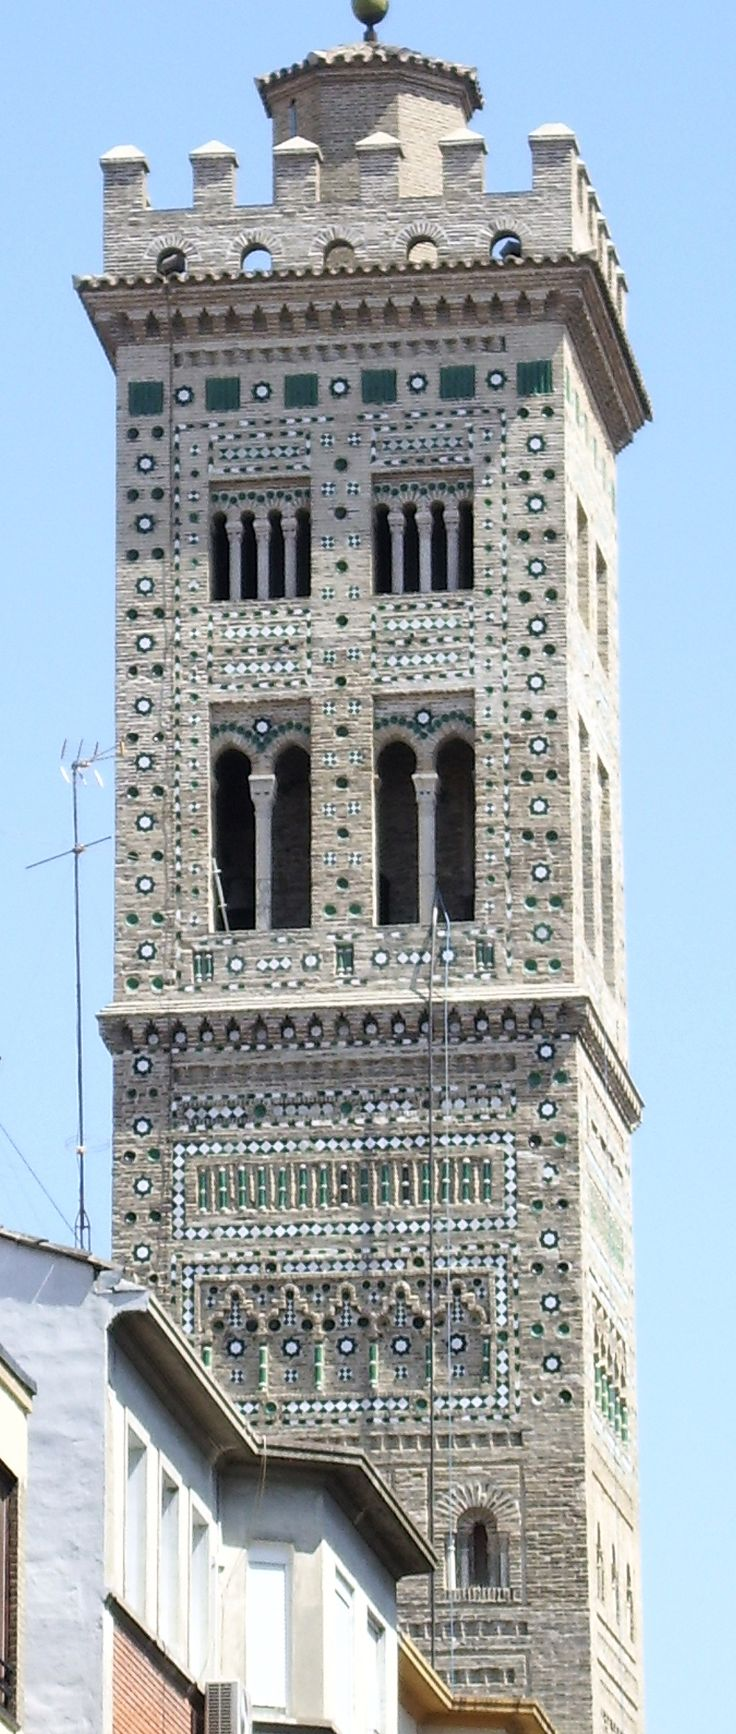 Torre de la iglesia de Santa María Magdalena, Zaragoza, España (mudéjar)